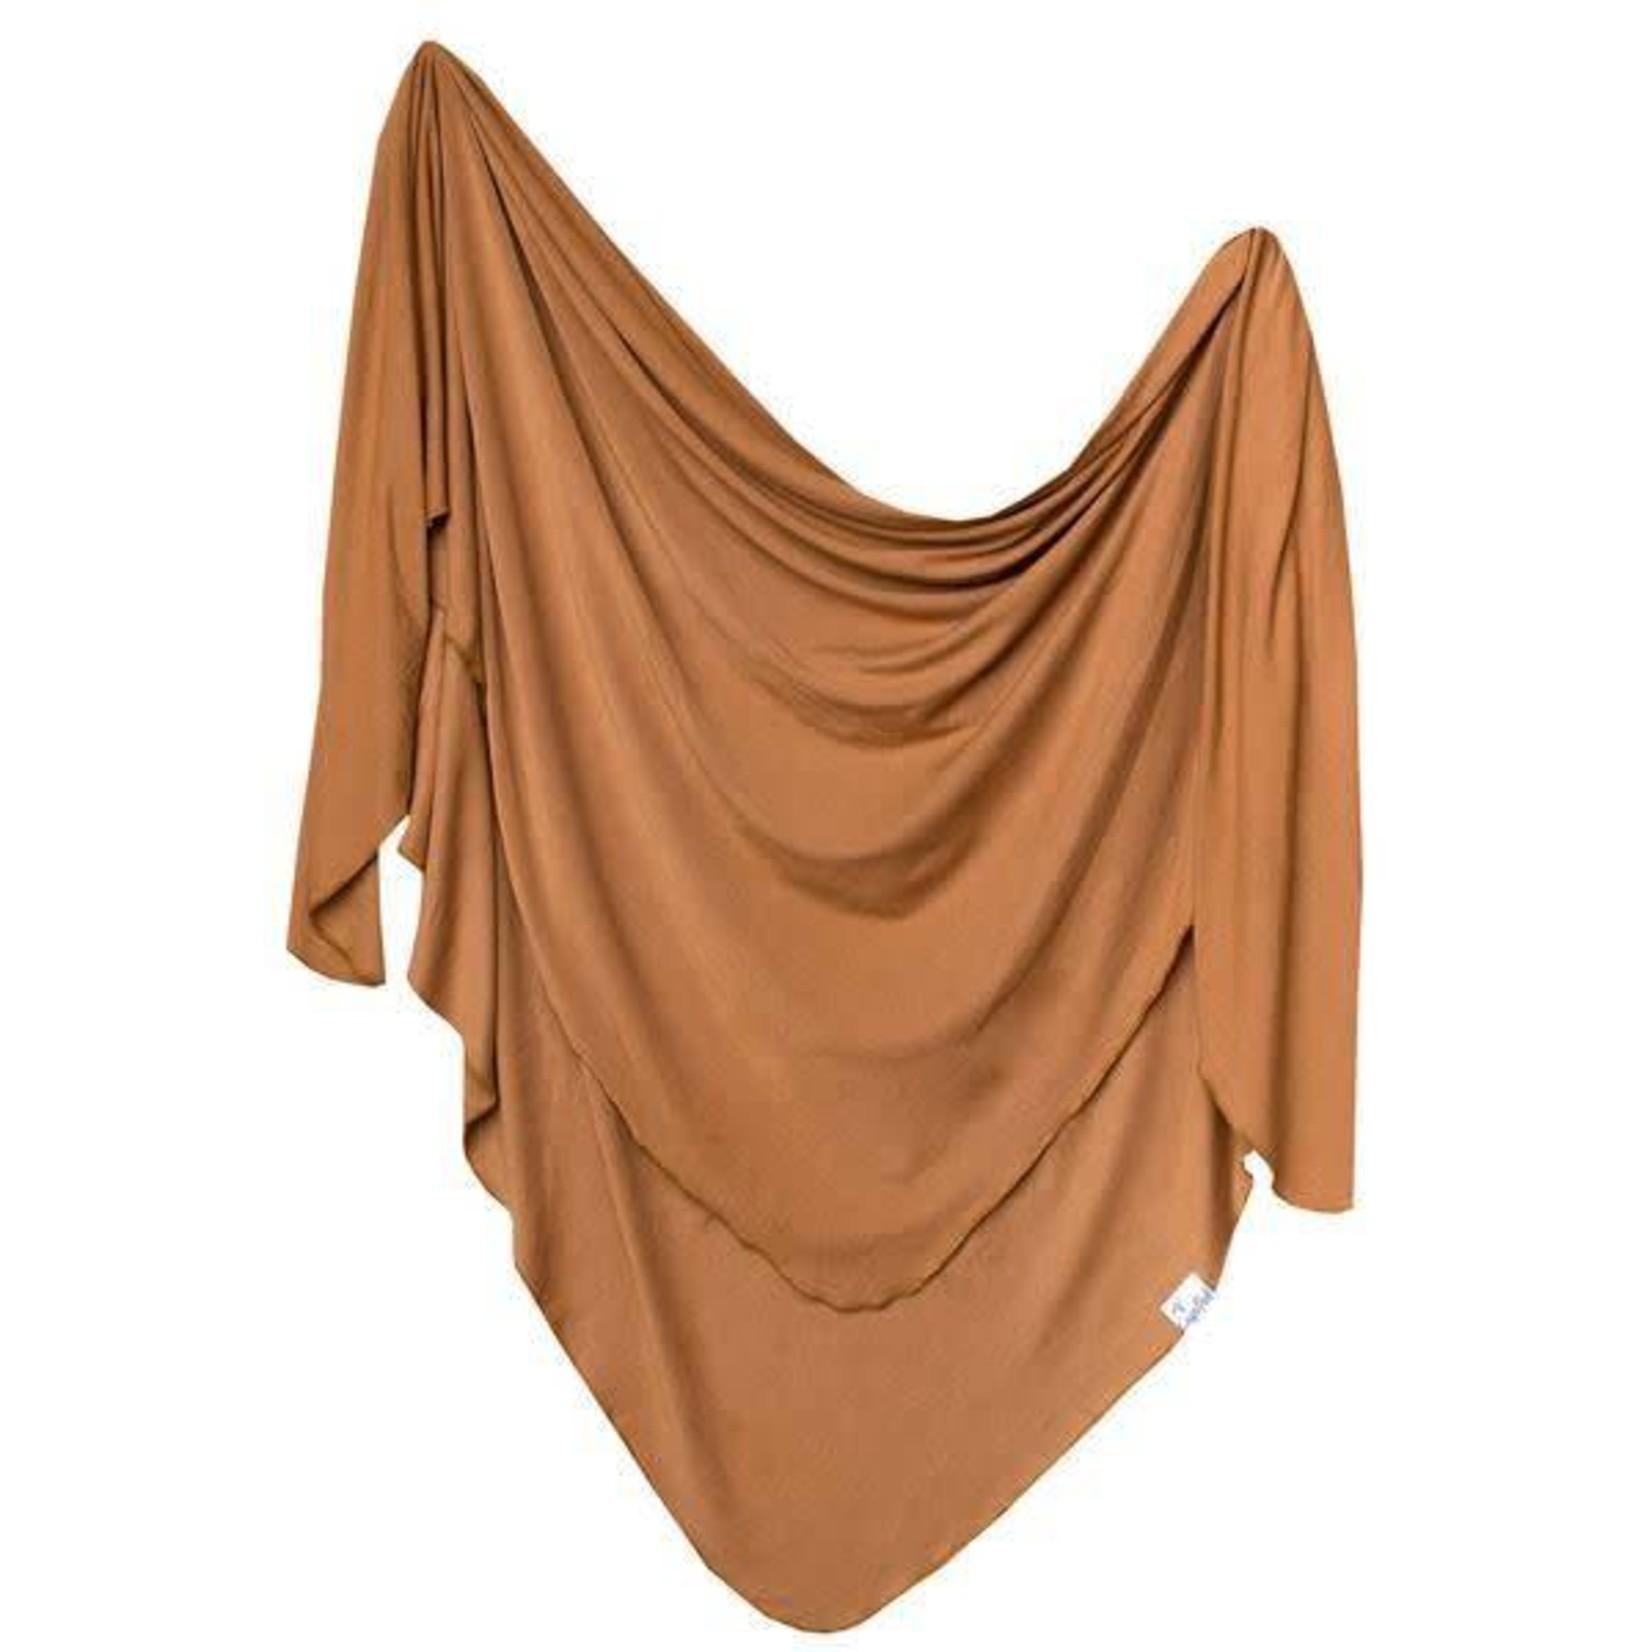 Copper Pearl Knit Blanket - Camel